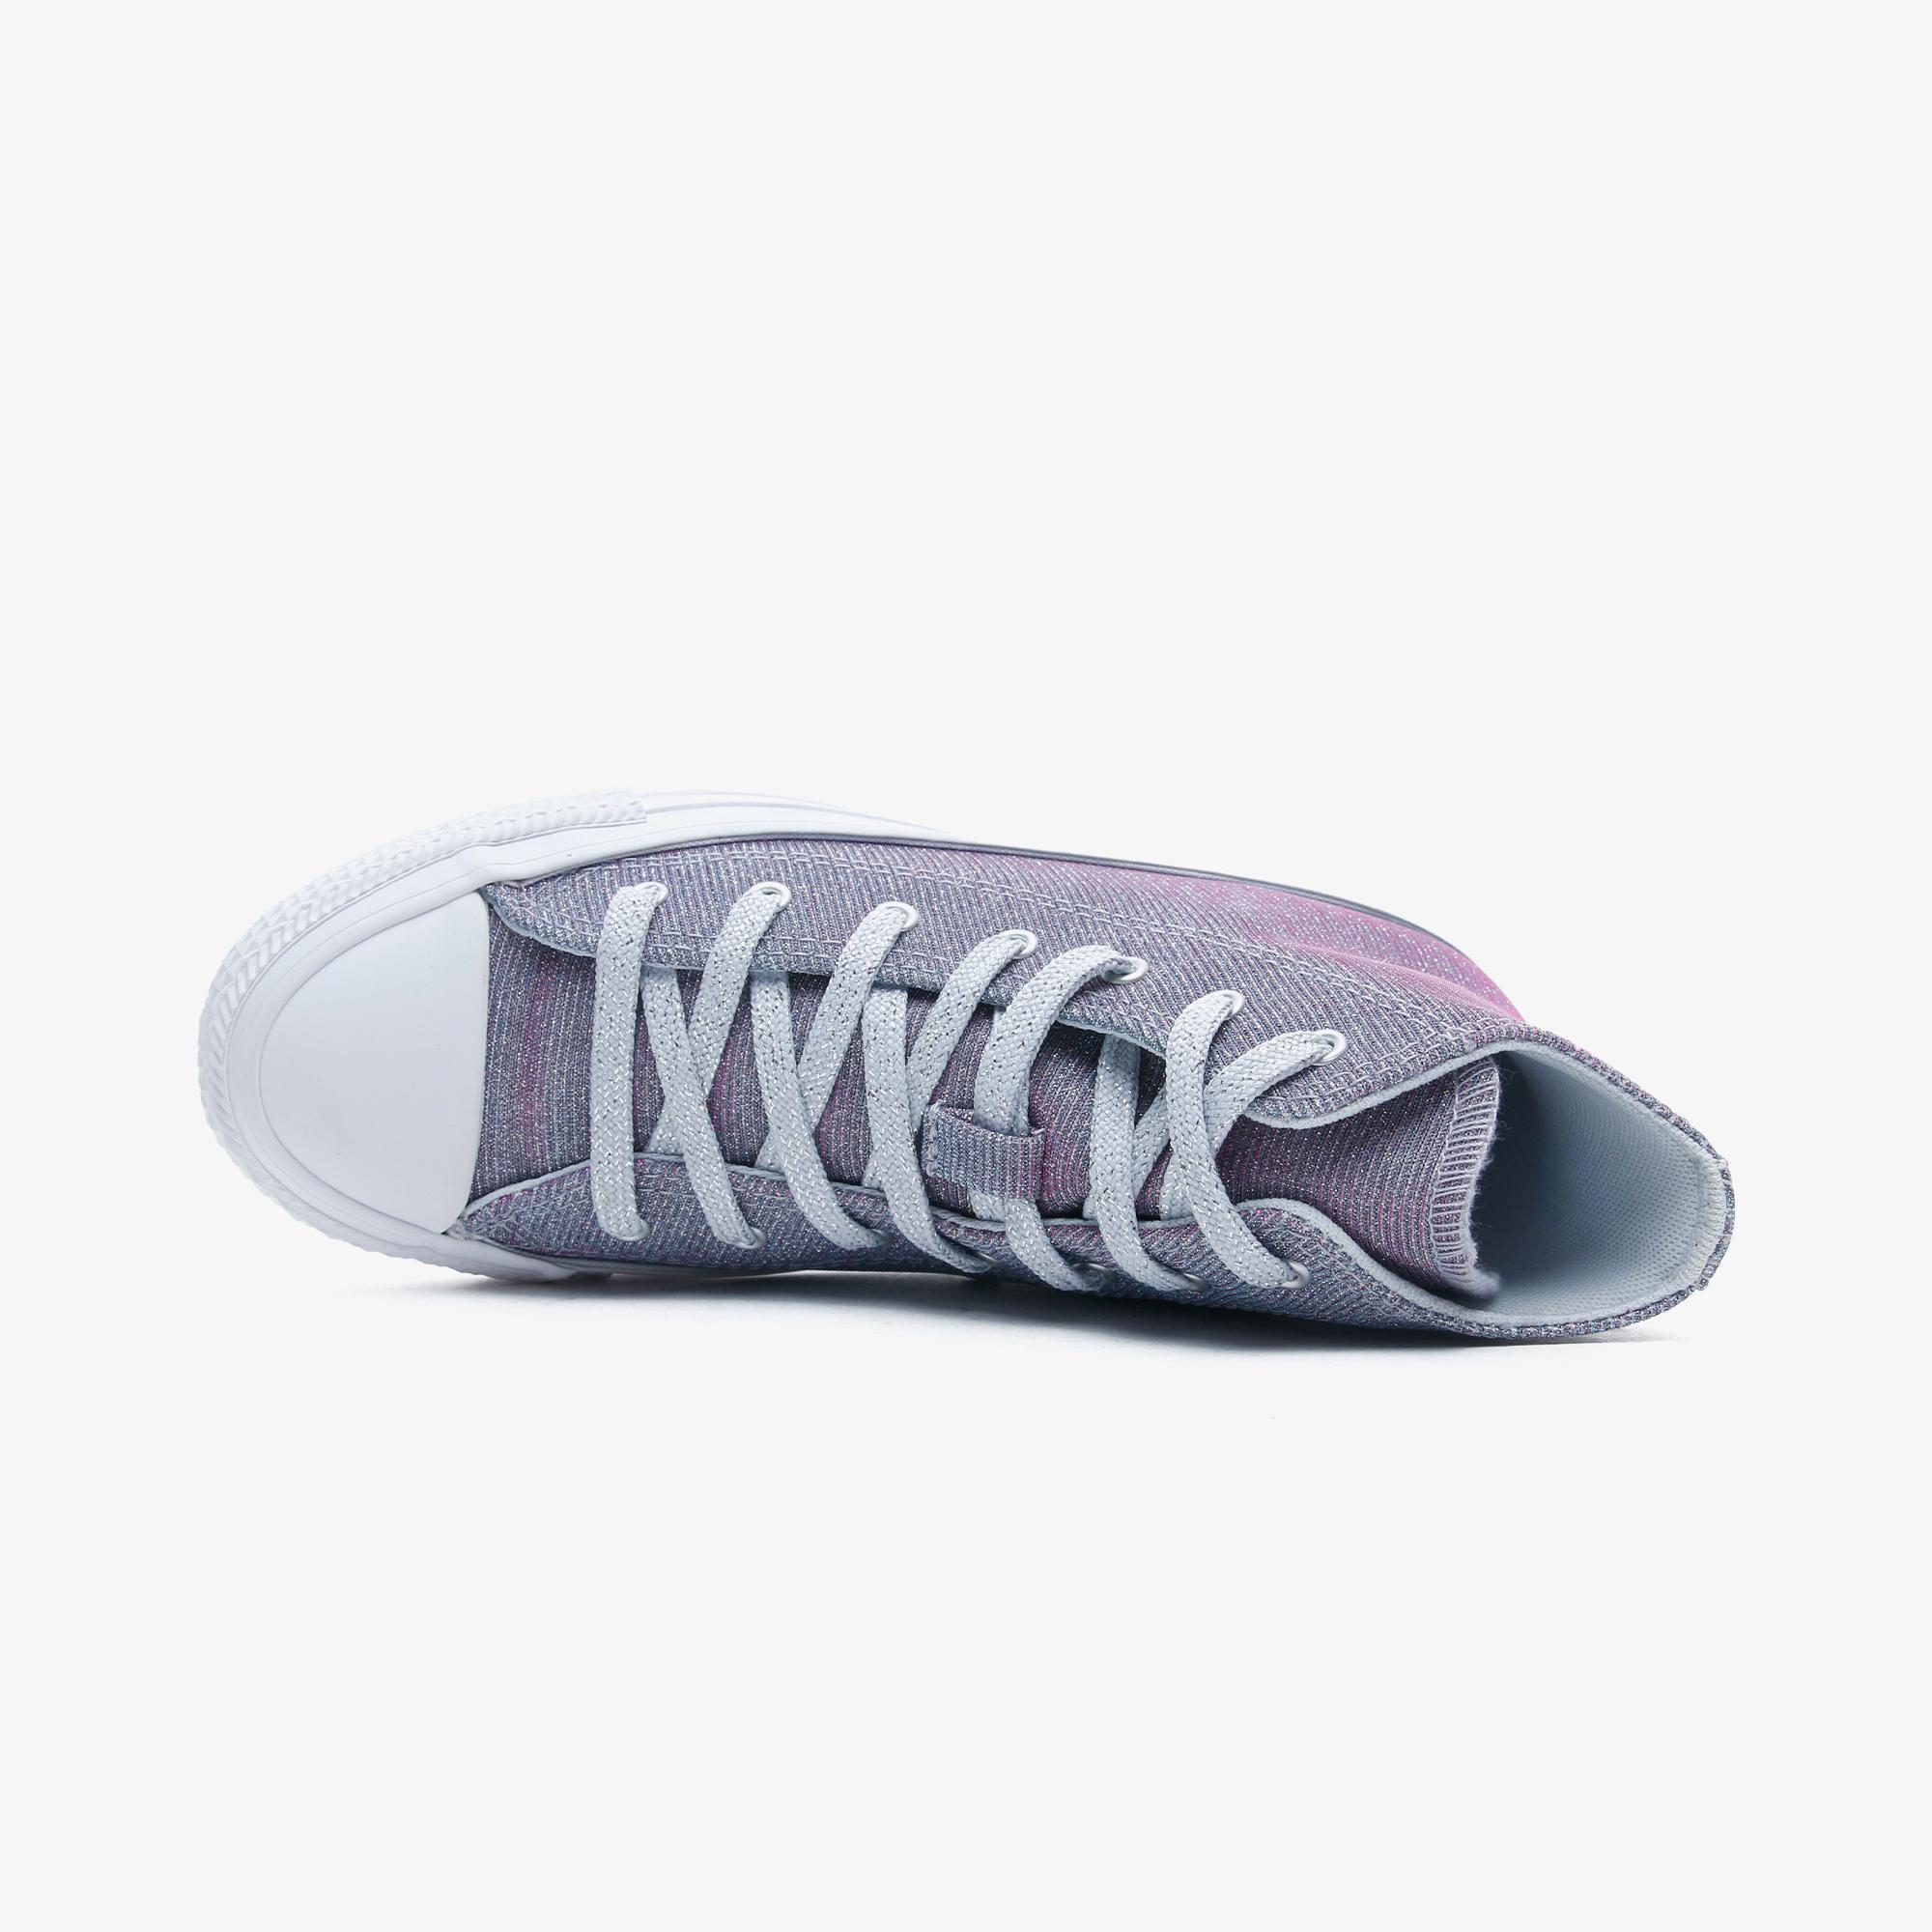 Converse Chuck Taylor All Star Hi Kadın Gri Sneaker